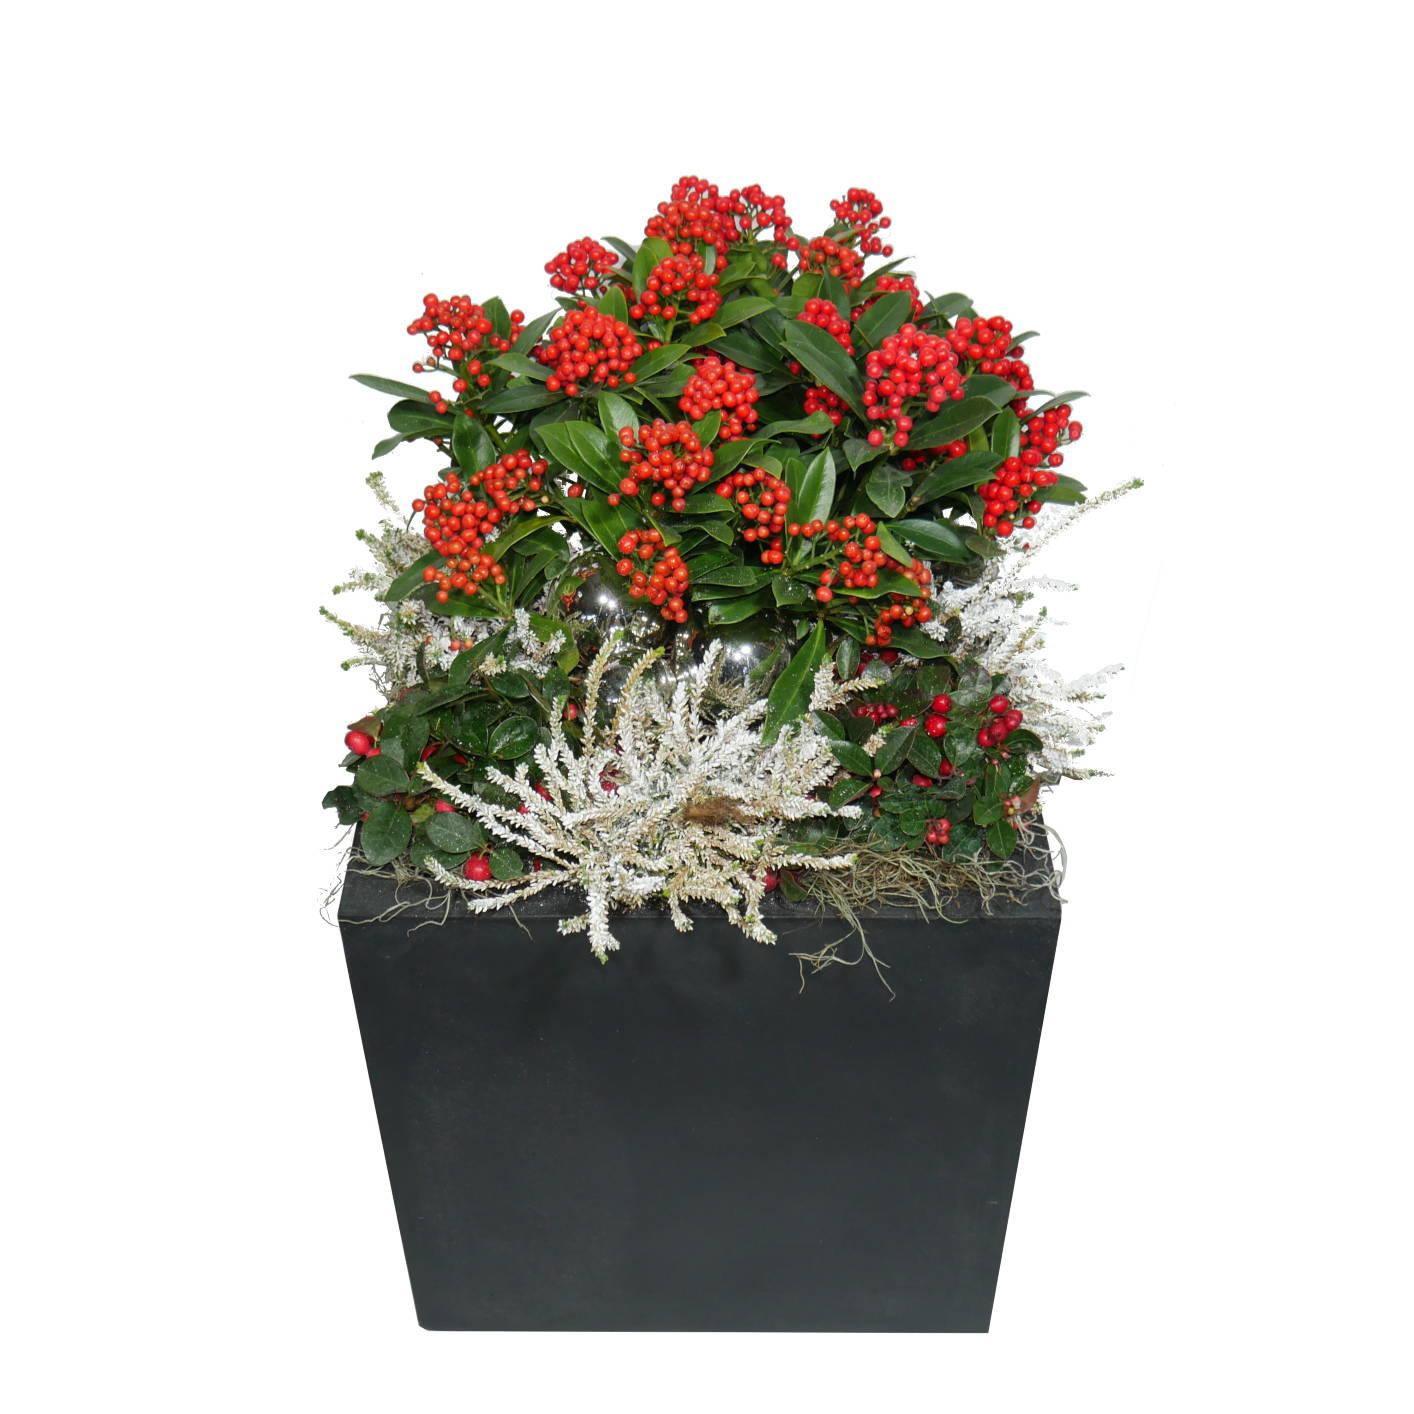 Pflanzgefäß Fiberstone Schwarz